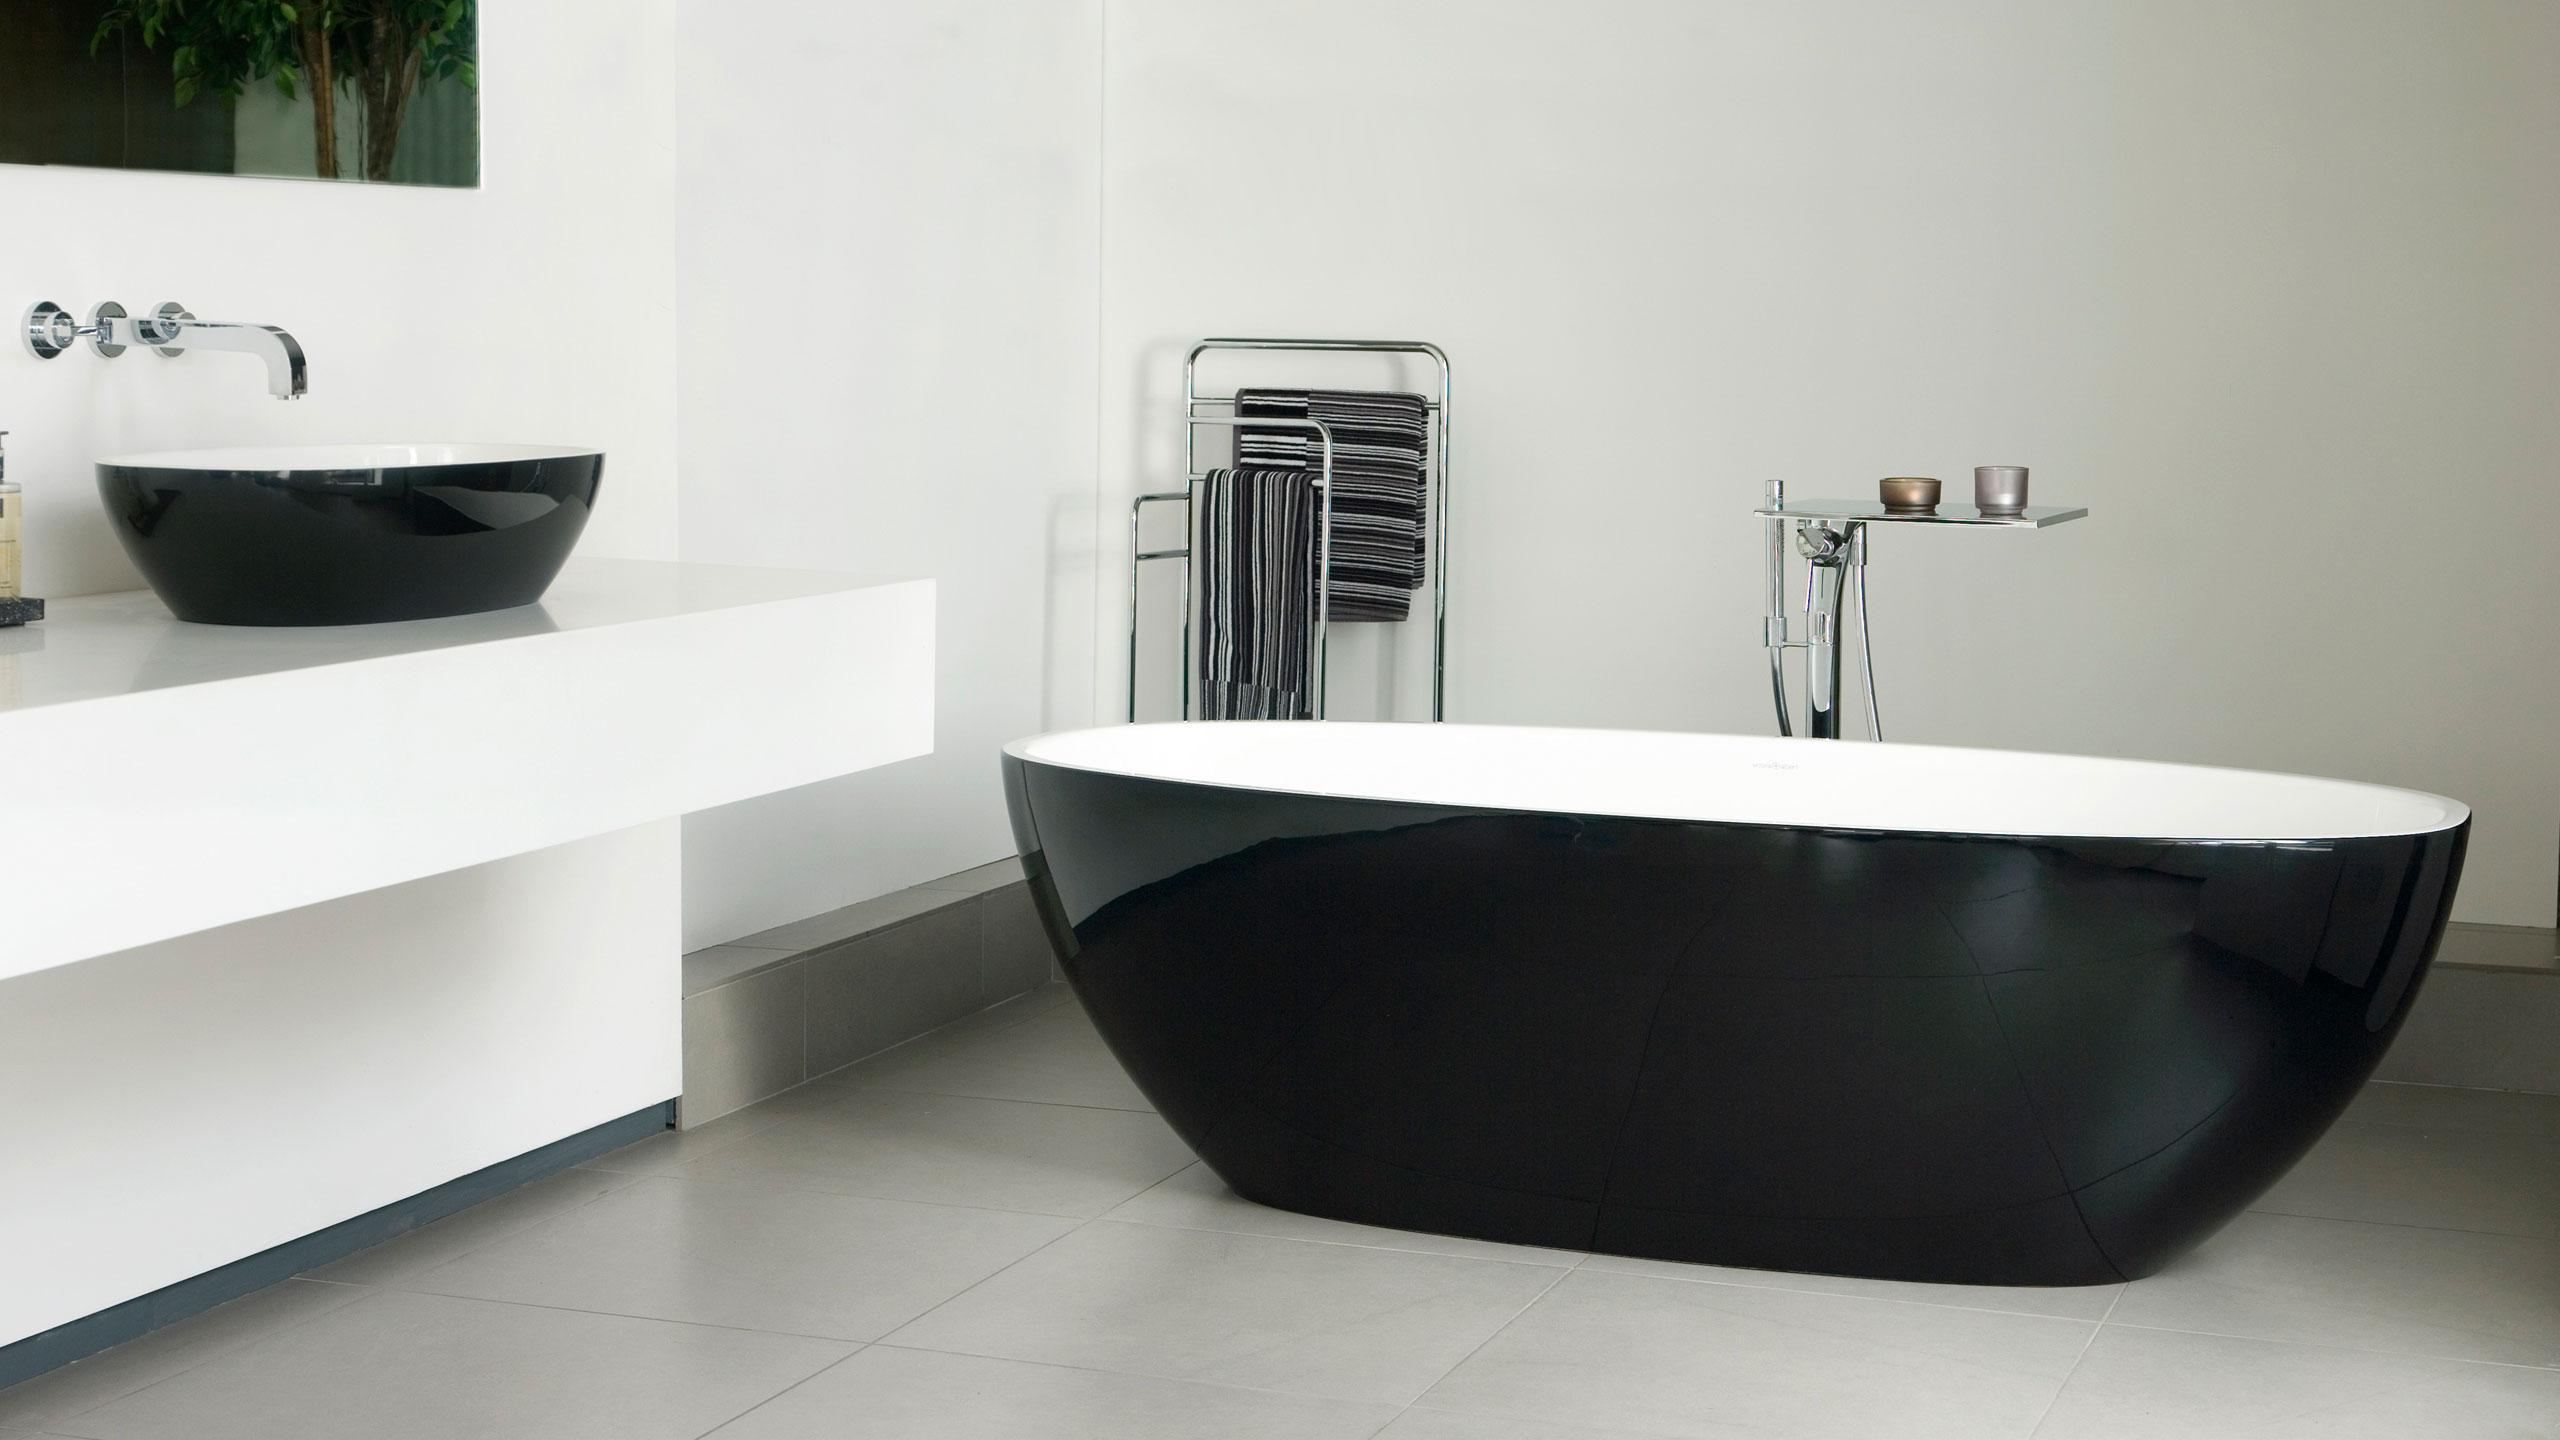 https://designerpages.s3.amazonaws.com/assets/61000311/Barcelona_Gallery_3black_EU.jpg